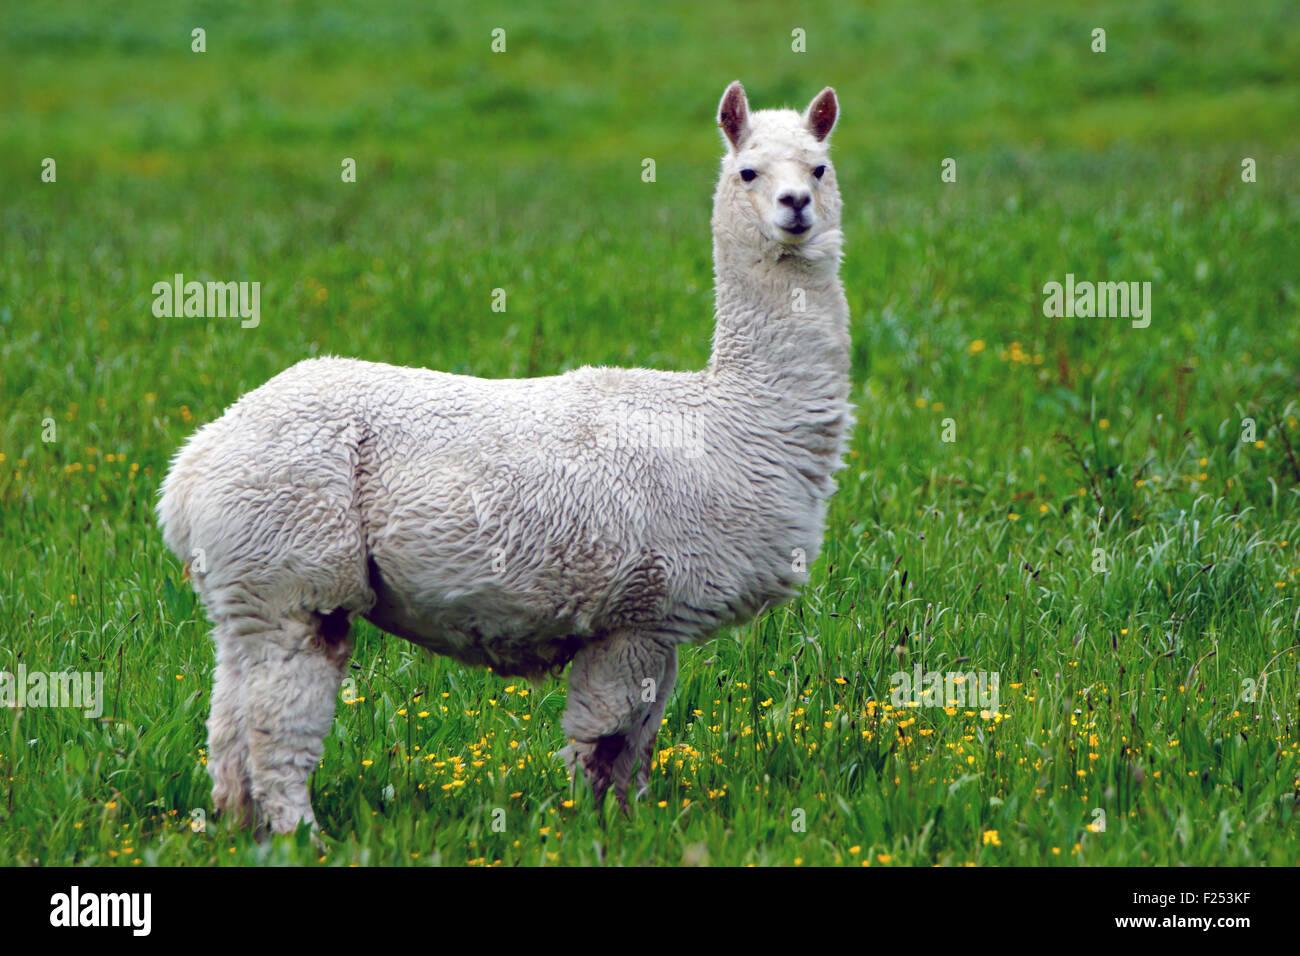 White alpaca, Vicugna pacos, in farm paddock, Westland, New Zealand Stock Photo